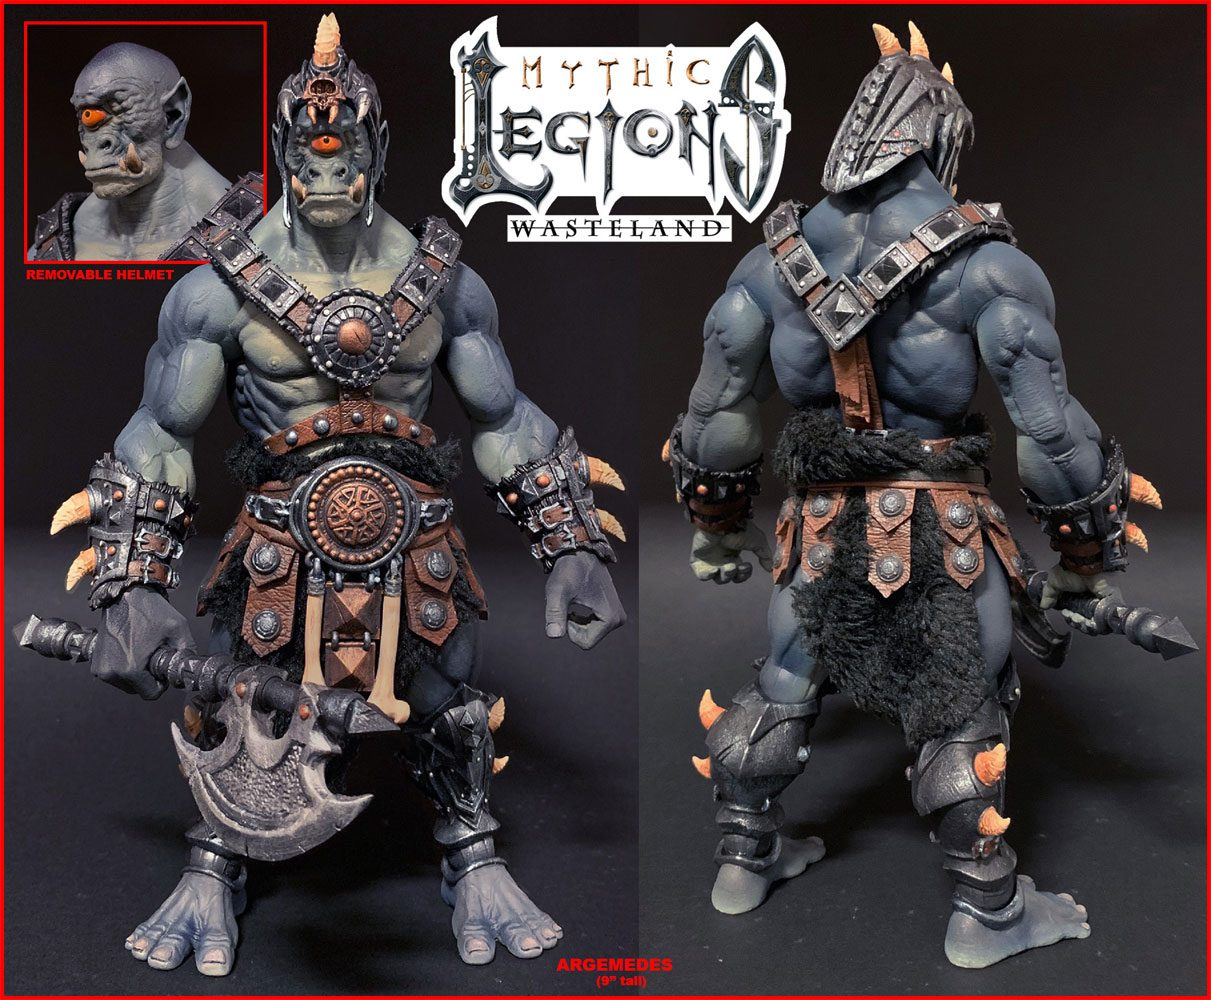 Mythic Legions: Wasteland Actionfigur Argemedes 23 cm